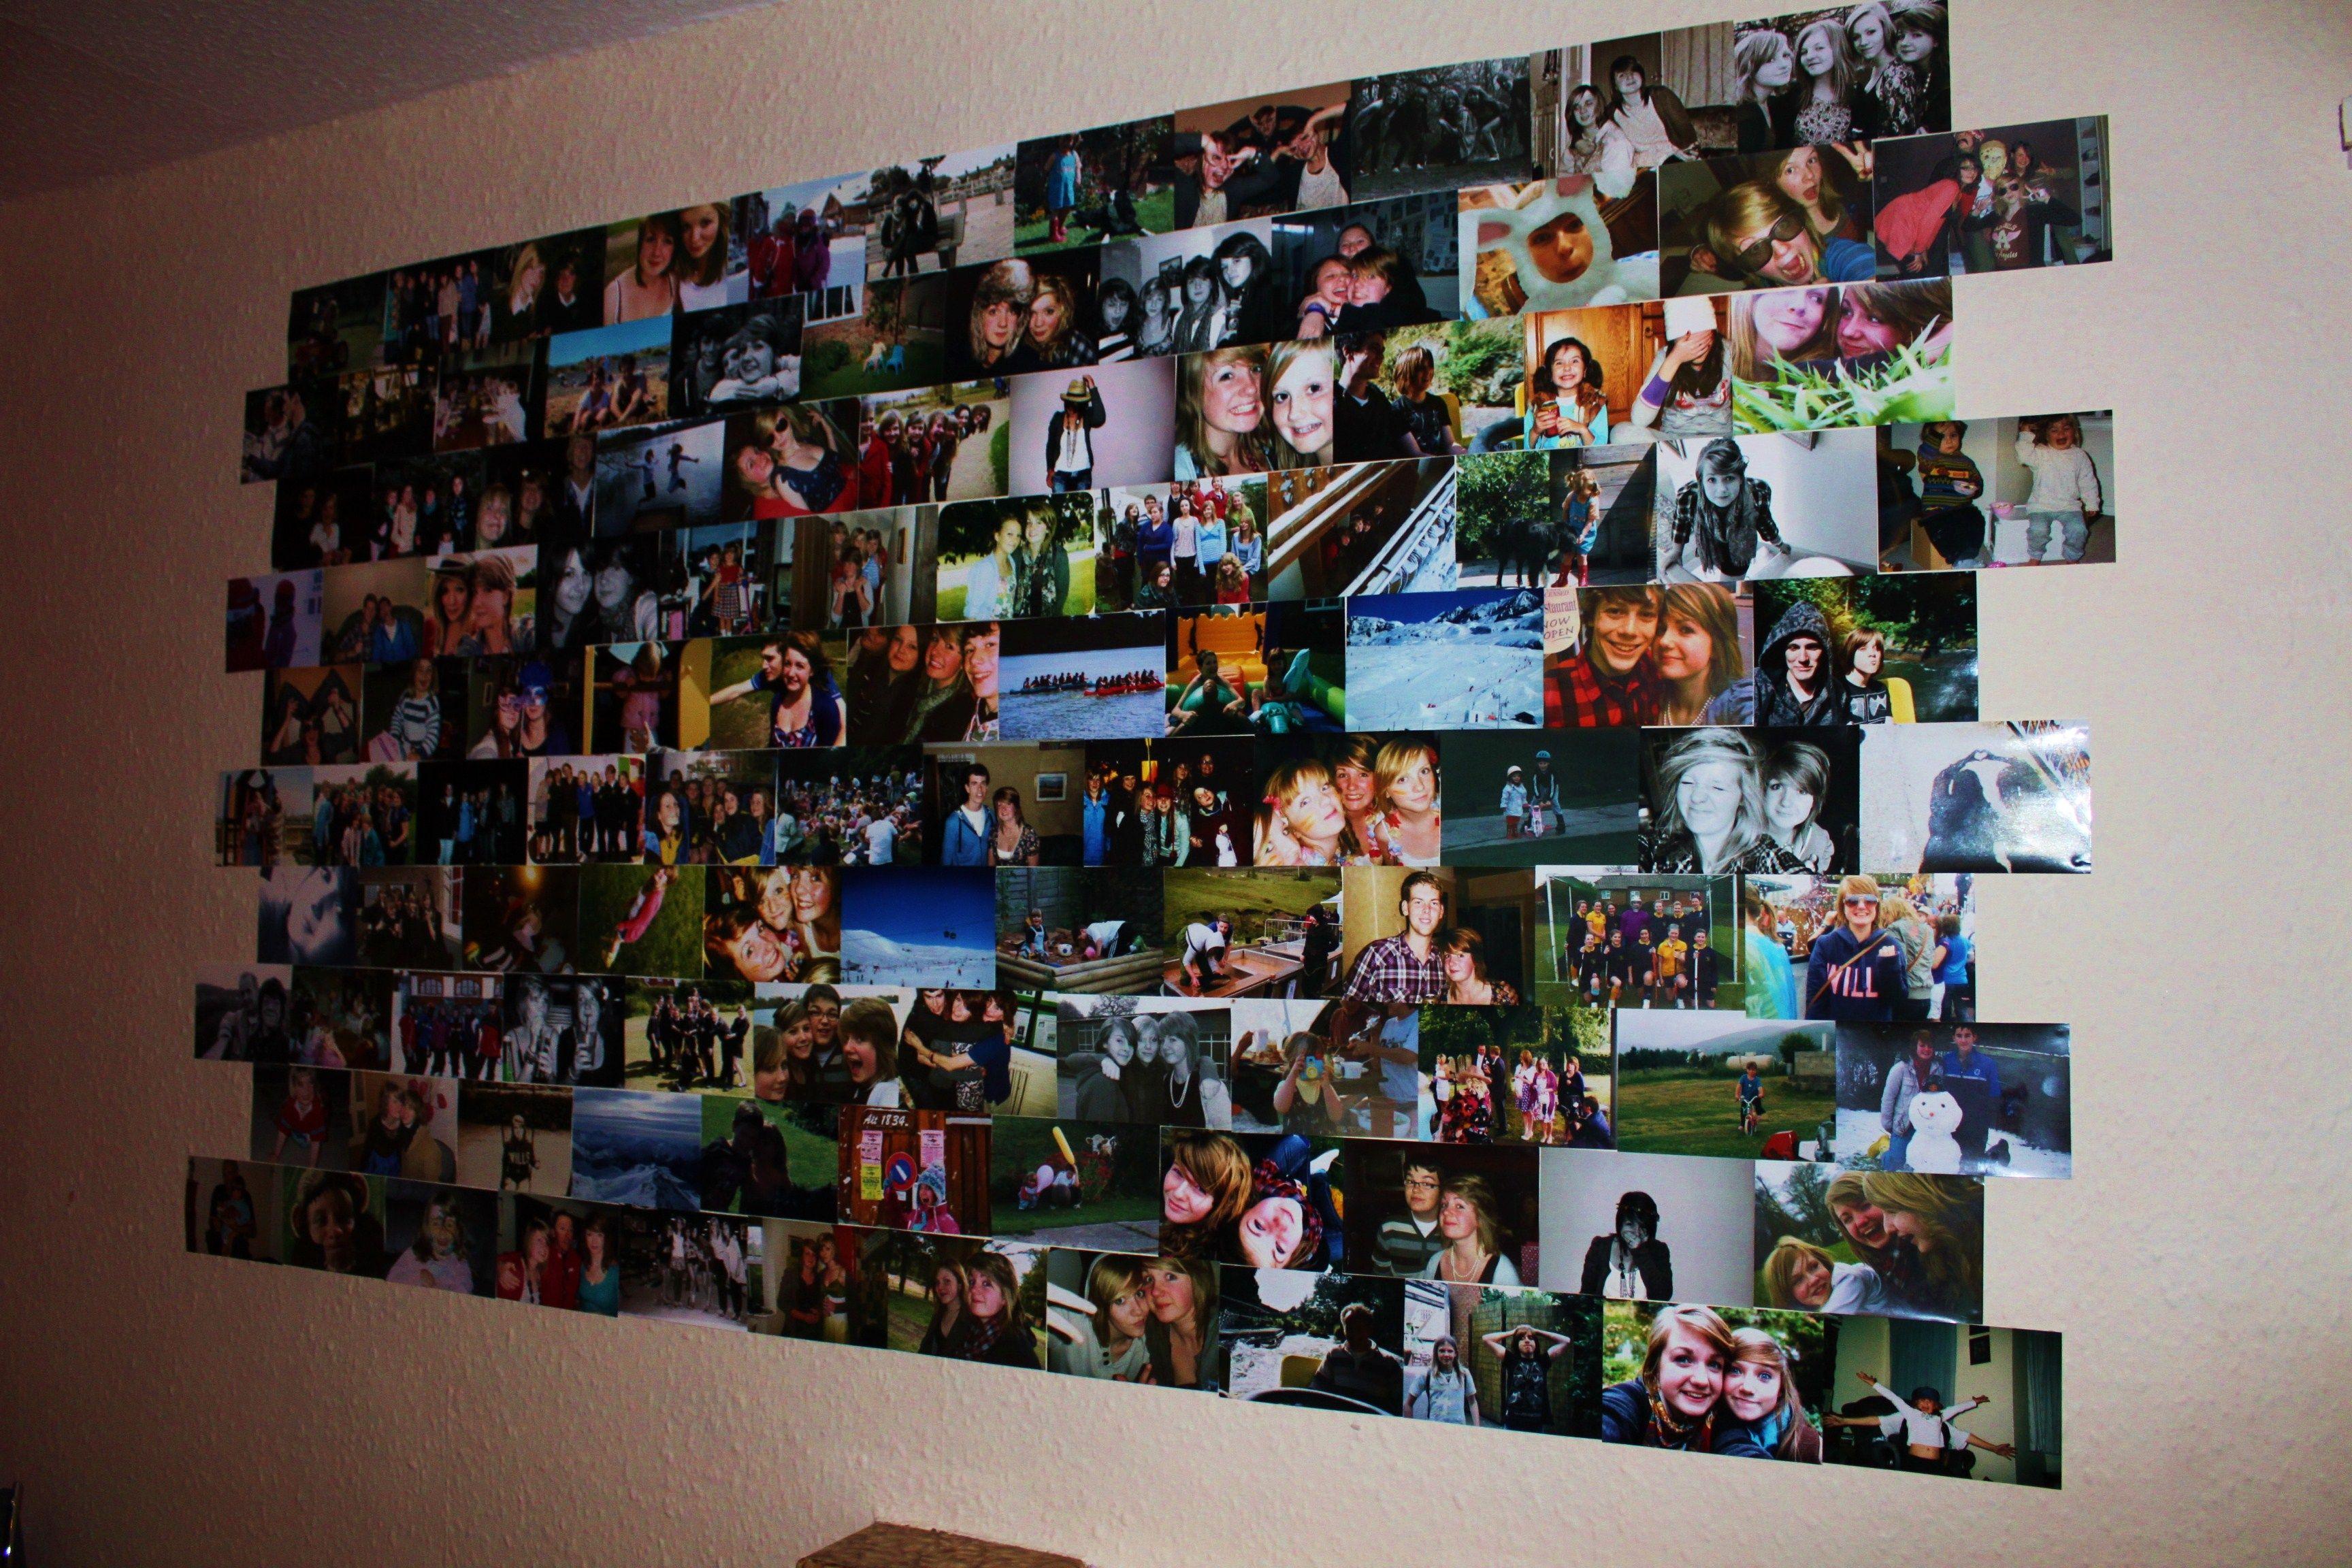 wall collage home decor pinterest. Black Bedroom Furniture Sets. Home Design Ideas